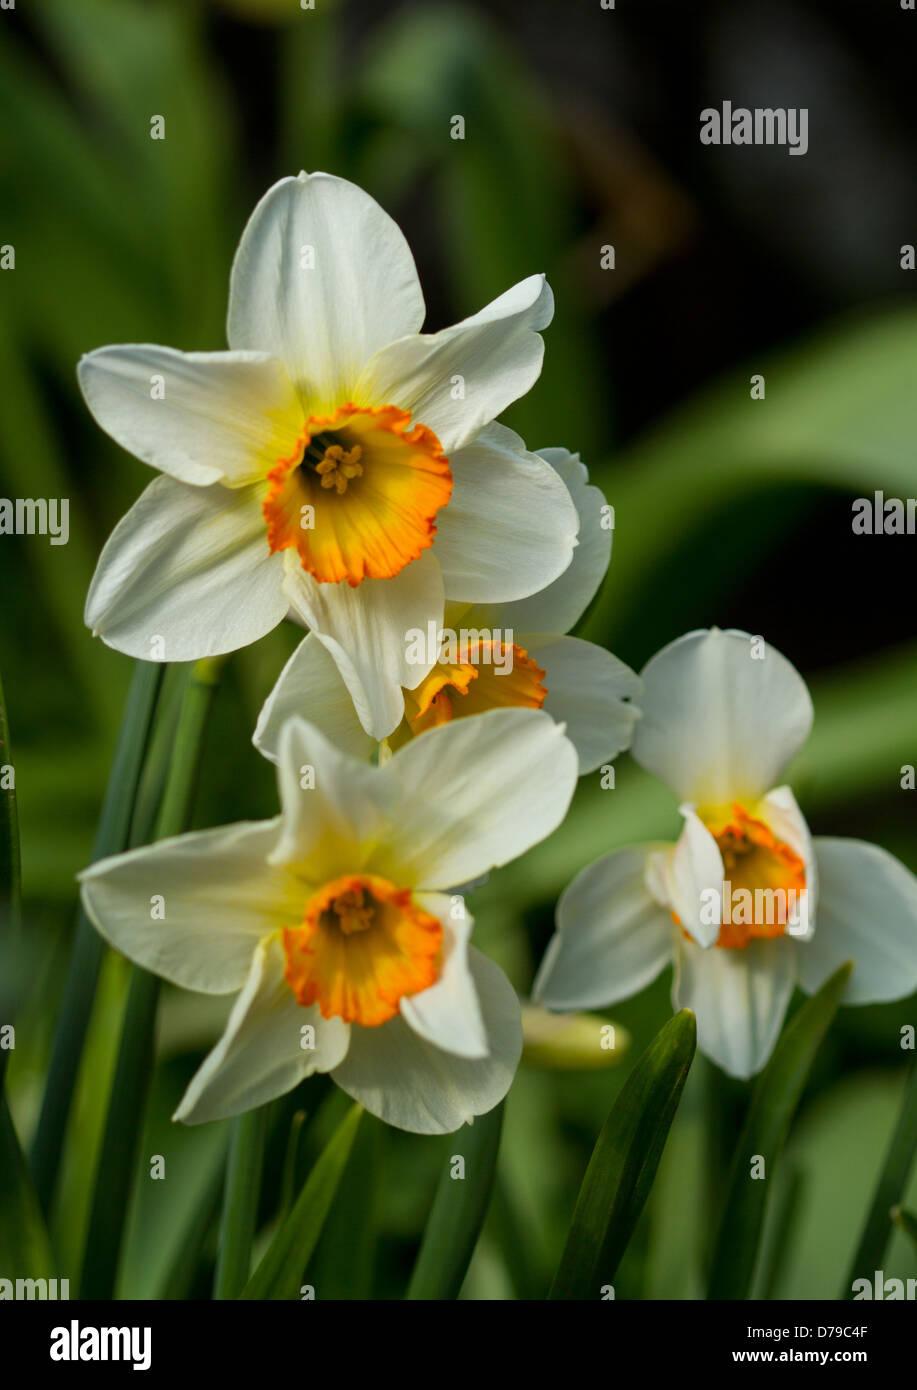 Orange and white narcissus jonquil daffodil flowers stock photo orange and white narcissus jonquil daffodil flowers mightylinksfo